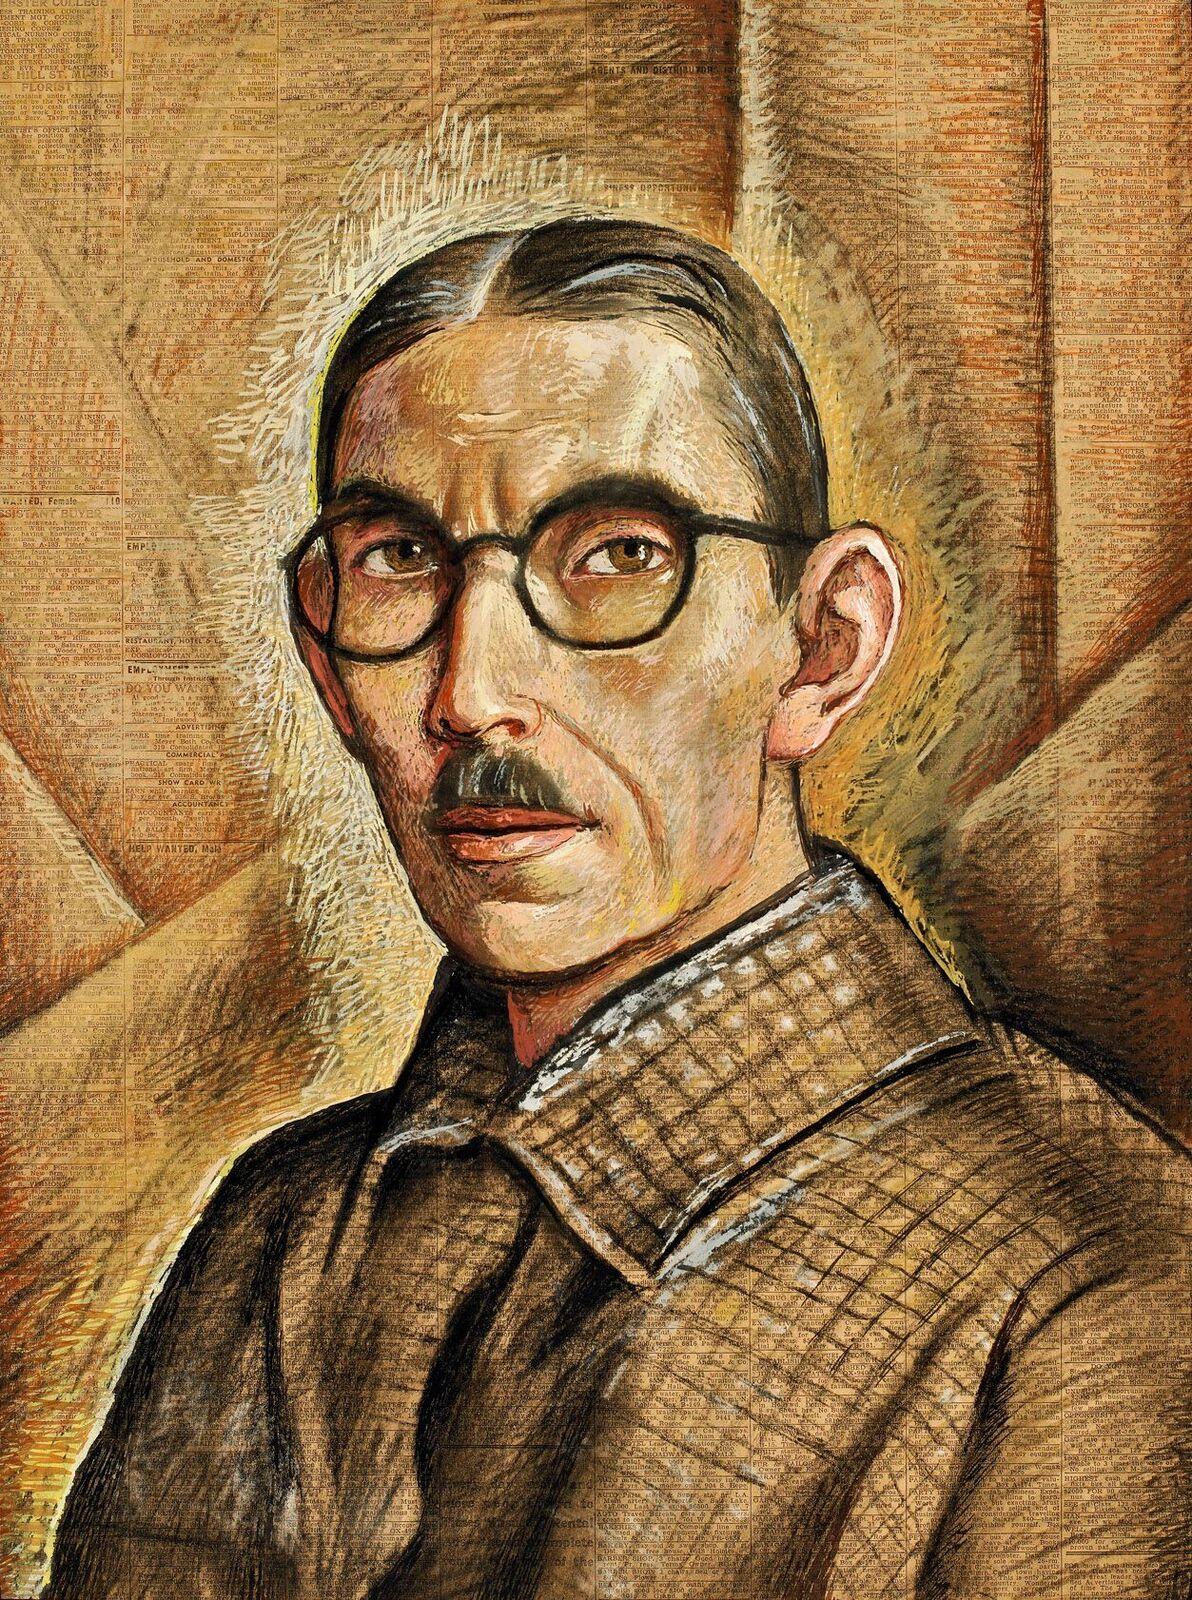 Alfredo Ramos Martinez (1871-1946)   Autoretrato/ Self Portrait , c. 1938  tempera on newsprint 20 3/4 x 15 1/4 inches; 53 x 39 centimeters